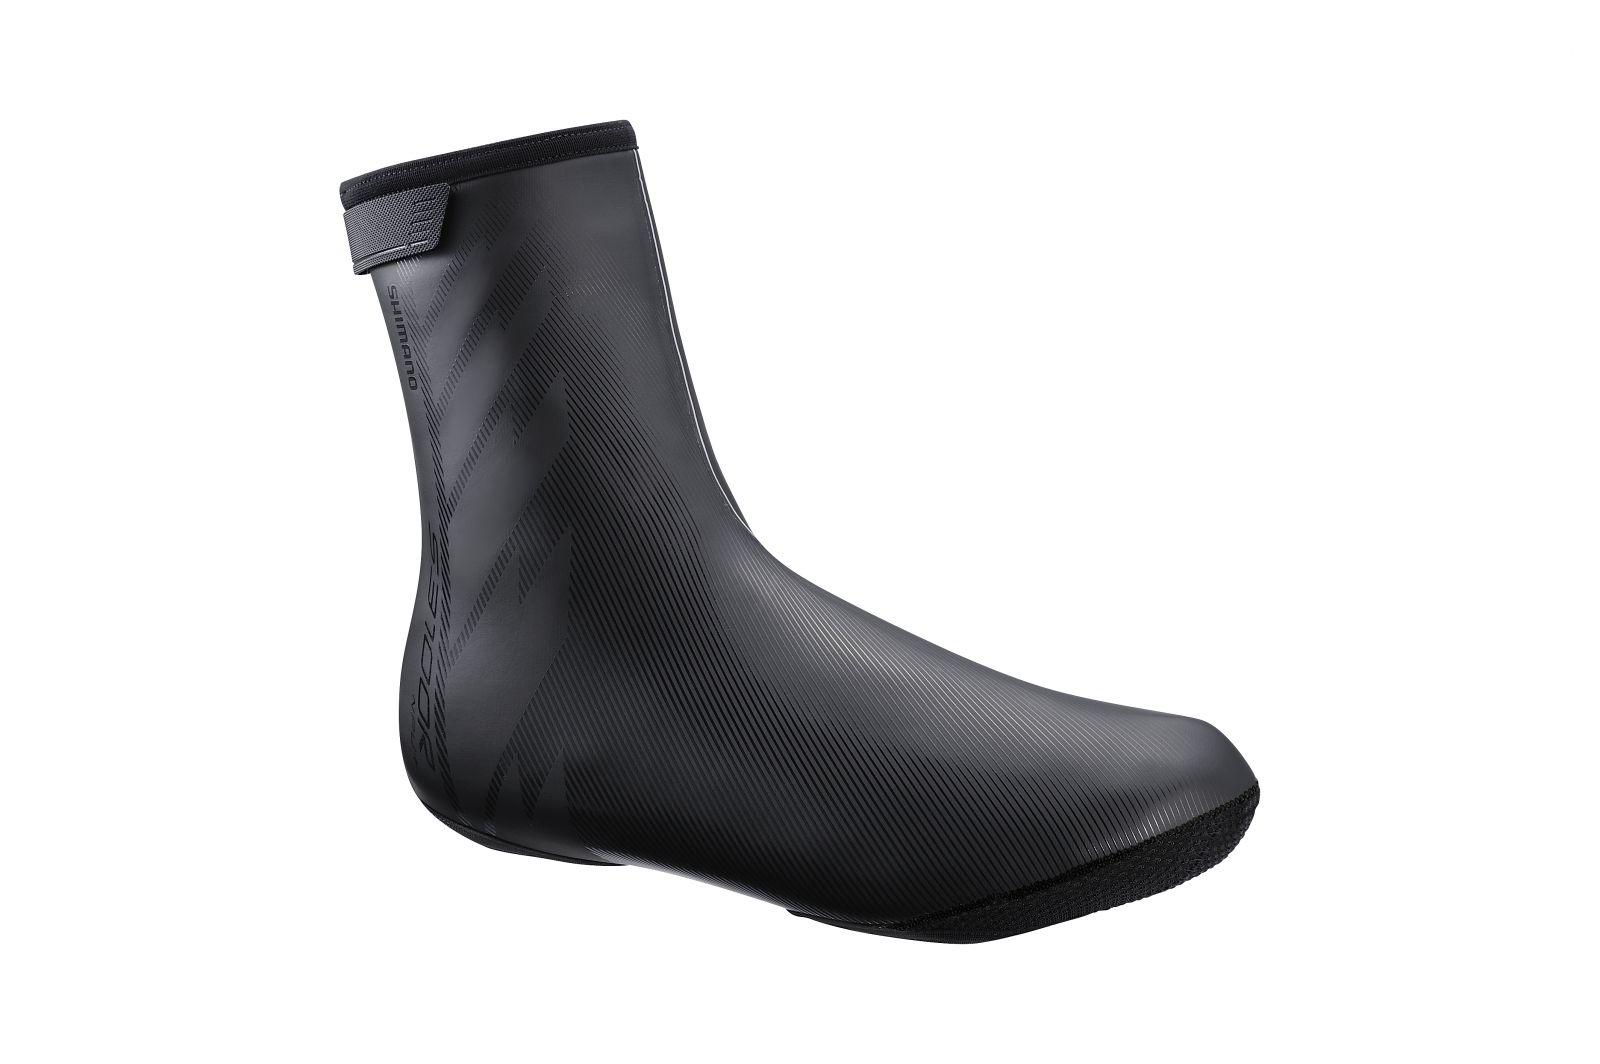 SHIMANO S3100R NPU+ návleky na obuv, černá, L